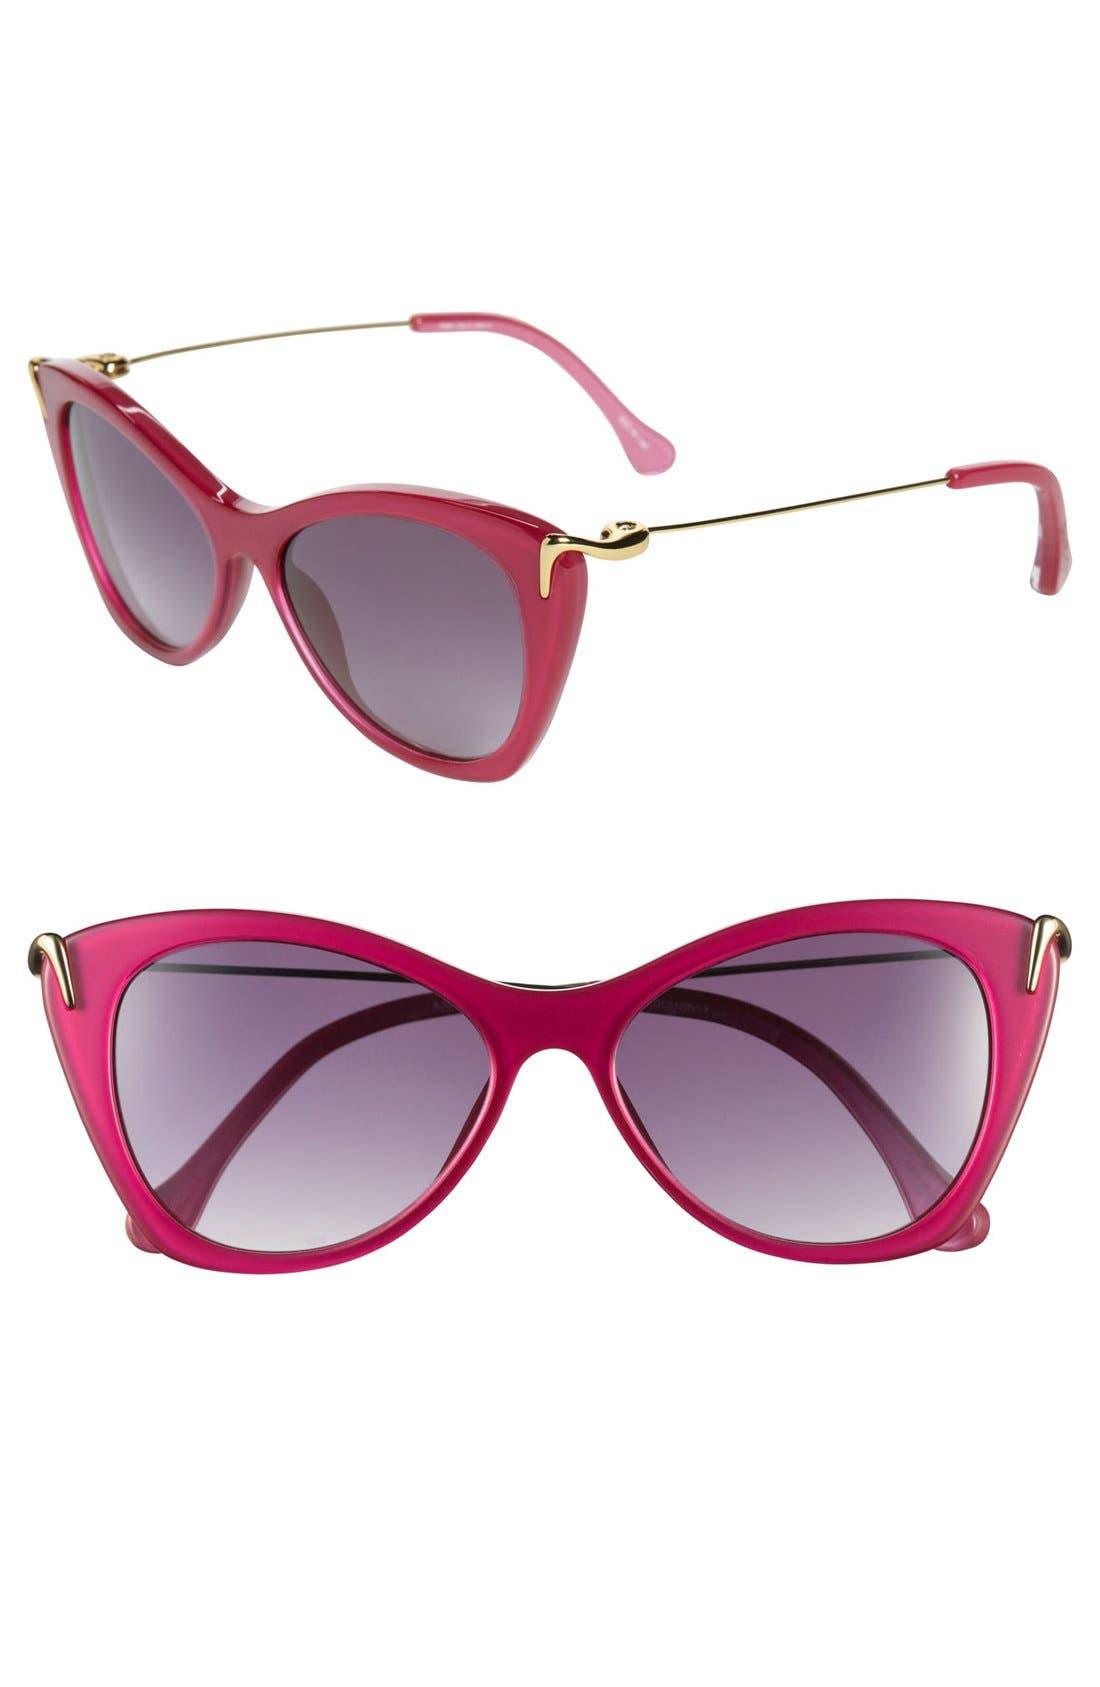 Alternate Image 1 Selected - Elizabeth and James 'Fillmore' 52mm Cat Eye Sunglasses